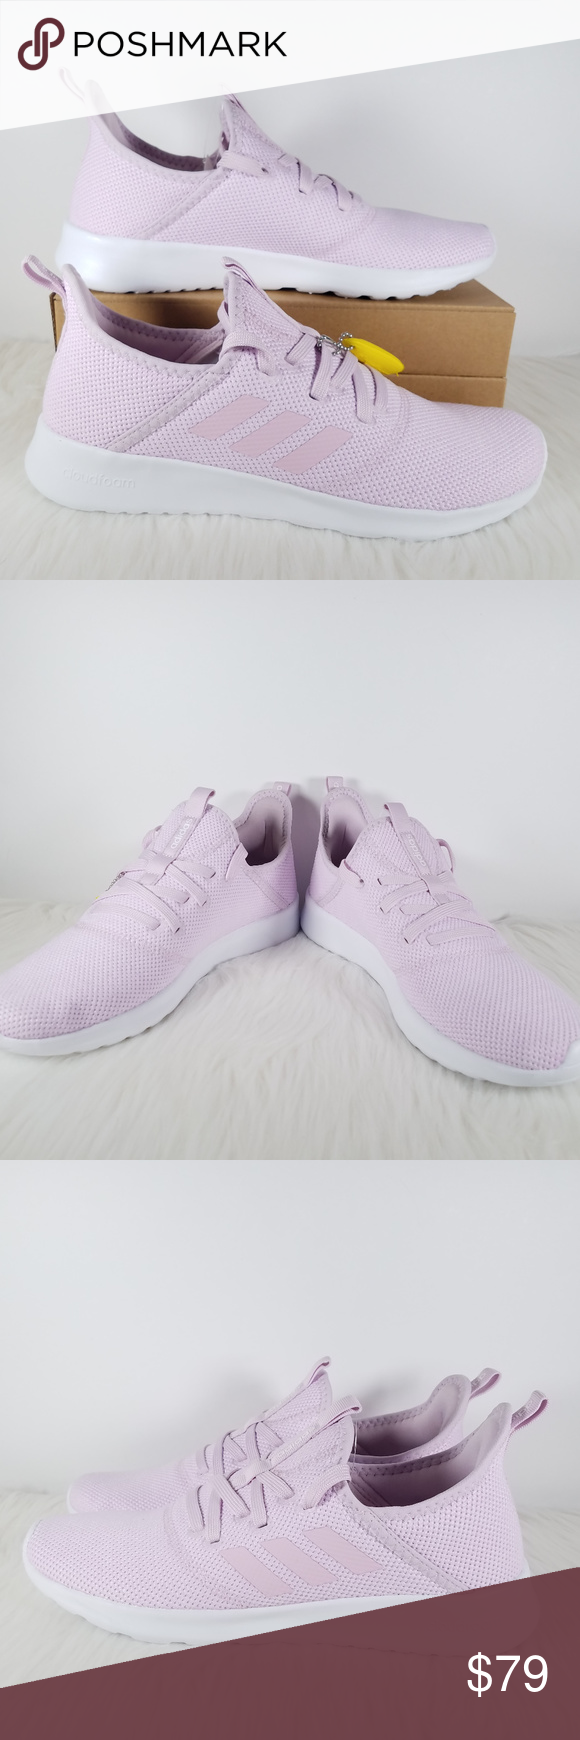 NEW Adidas Cloudfoam Pure Aero Pink Womens Running Brand New